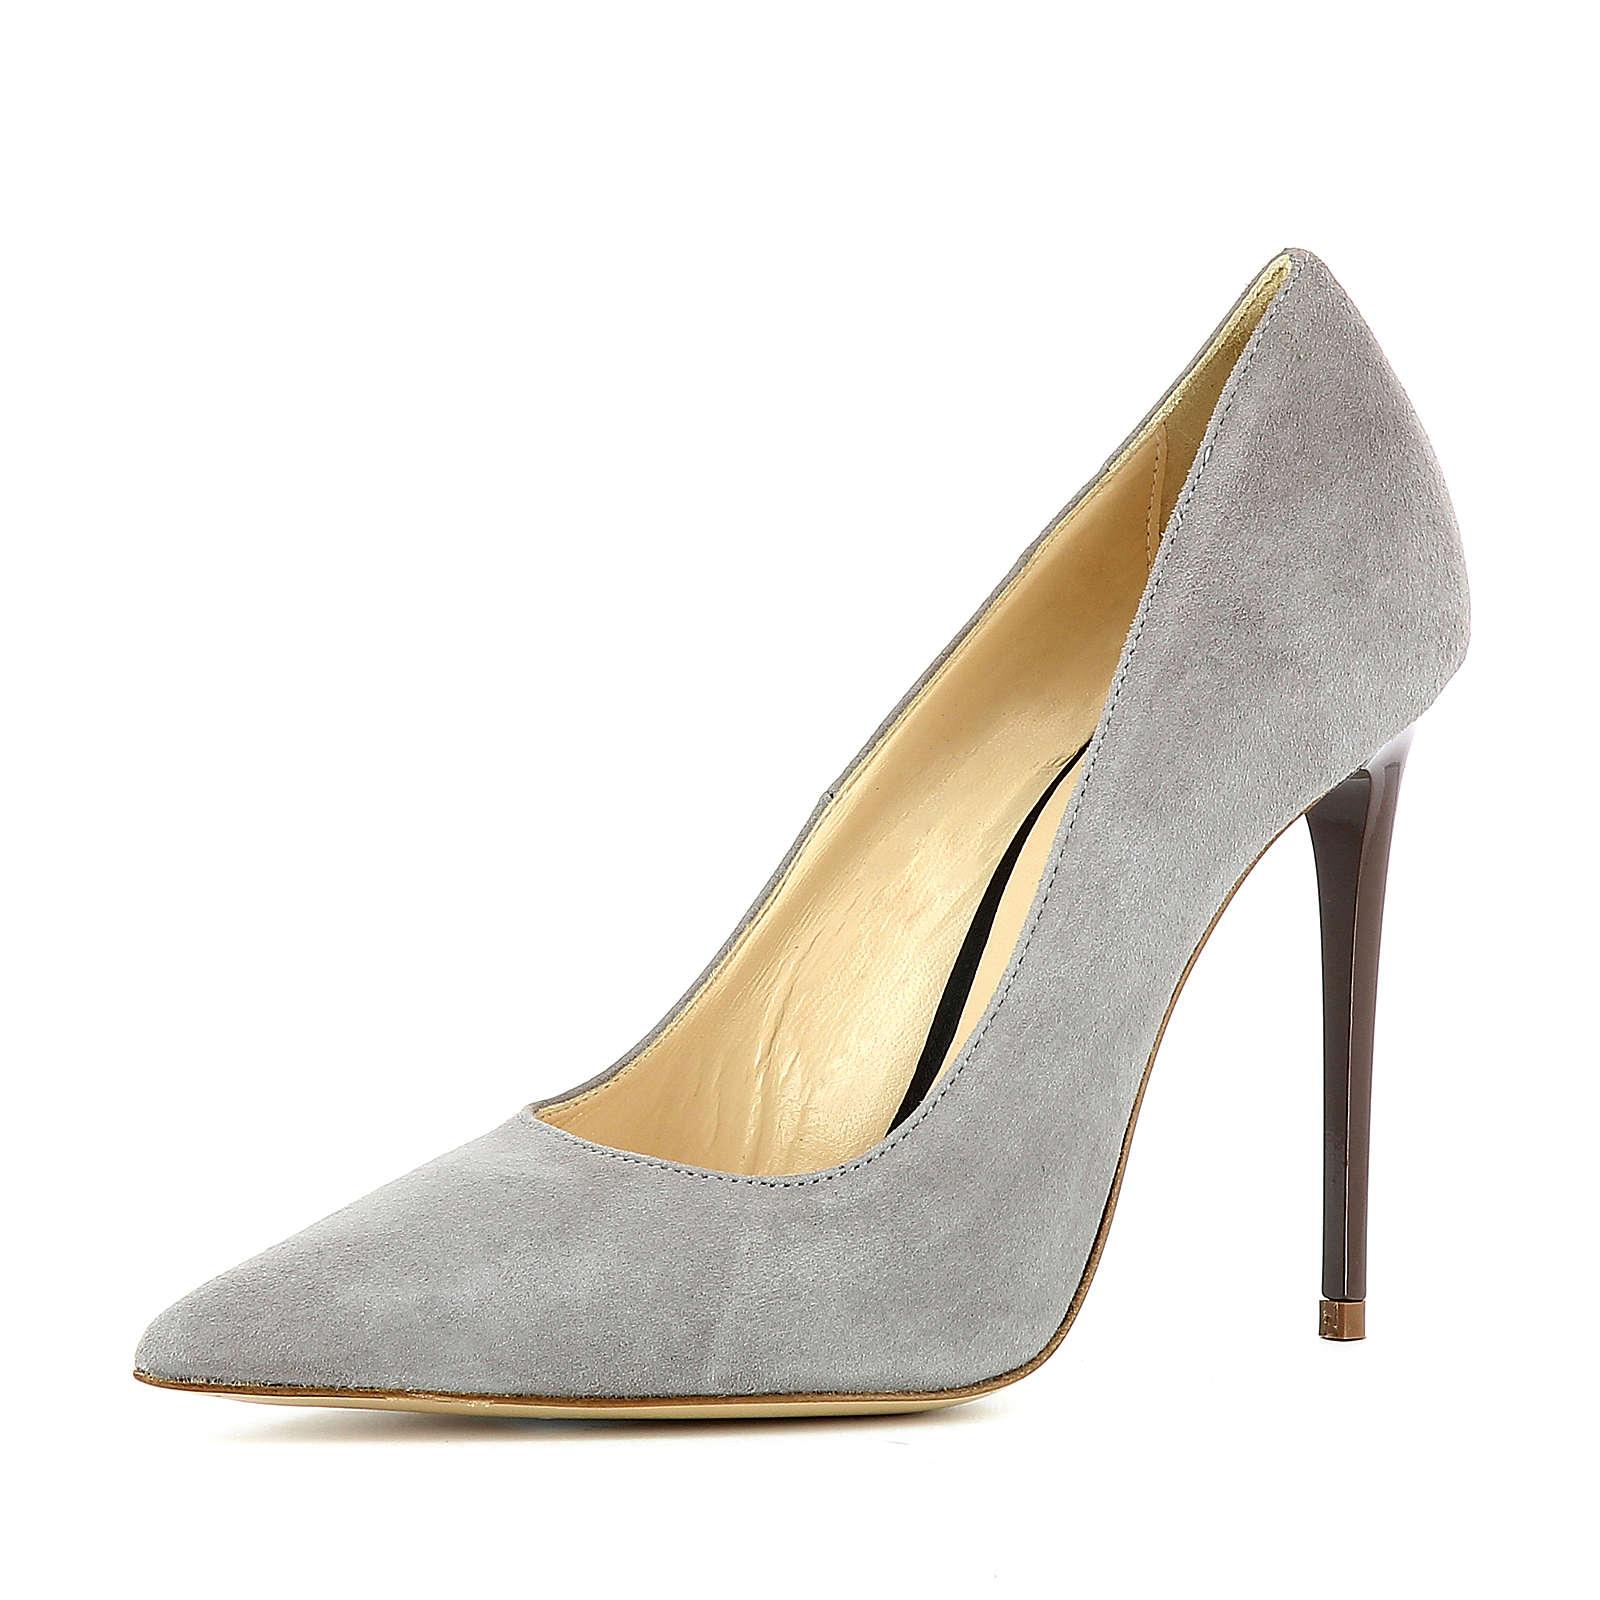 Evita Shoes Klassische Pumps DESIDERIA hellgrau Damen Gr. 36